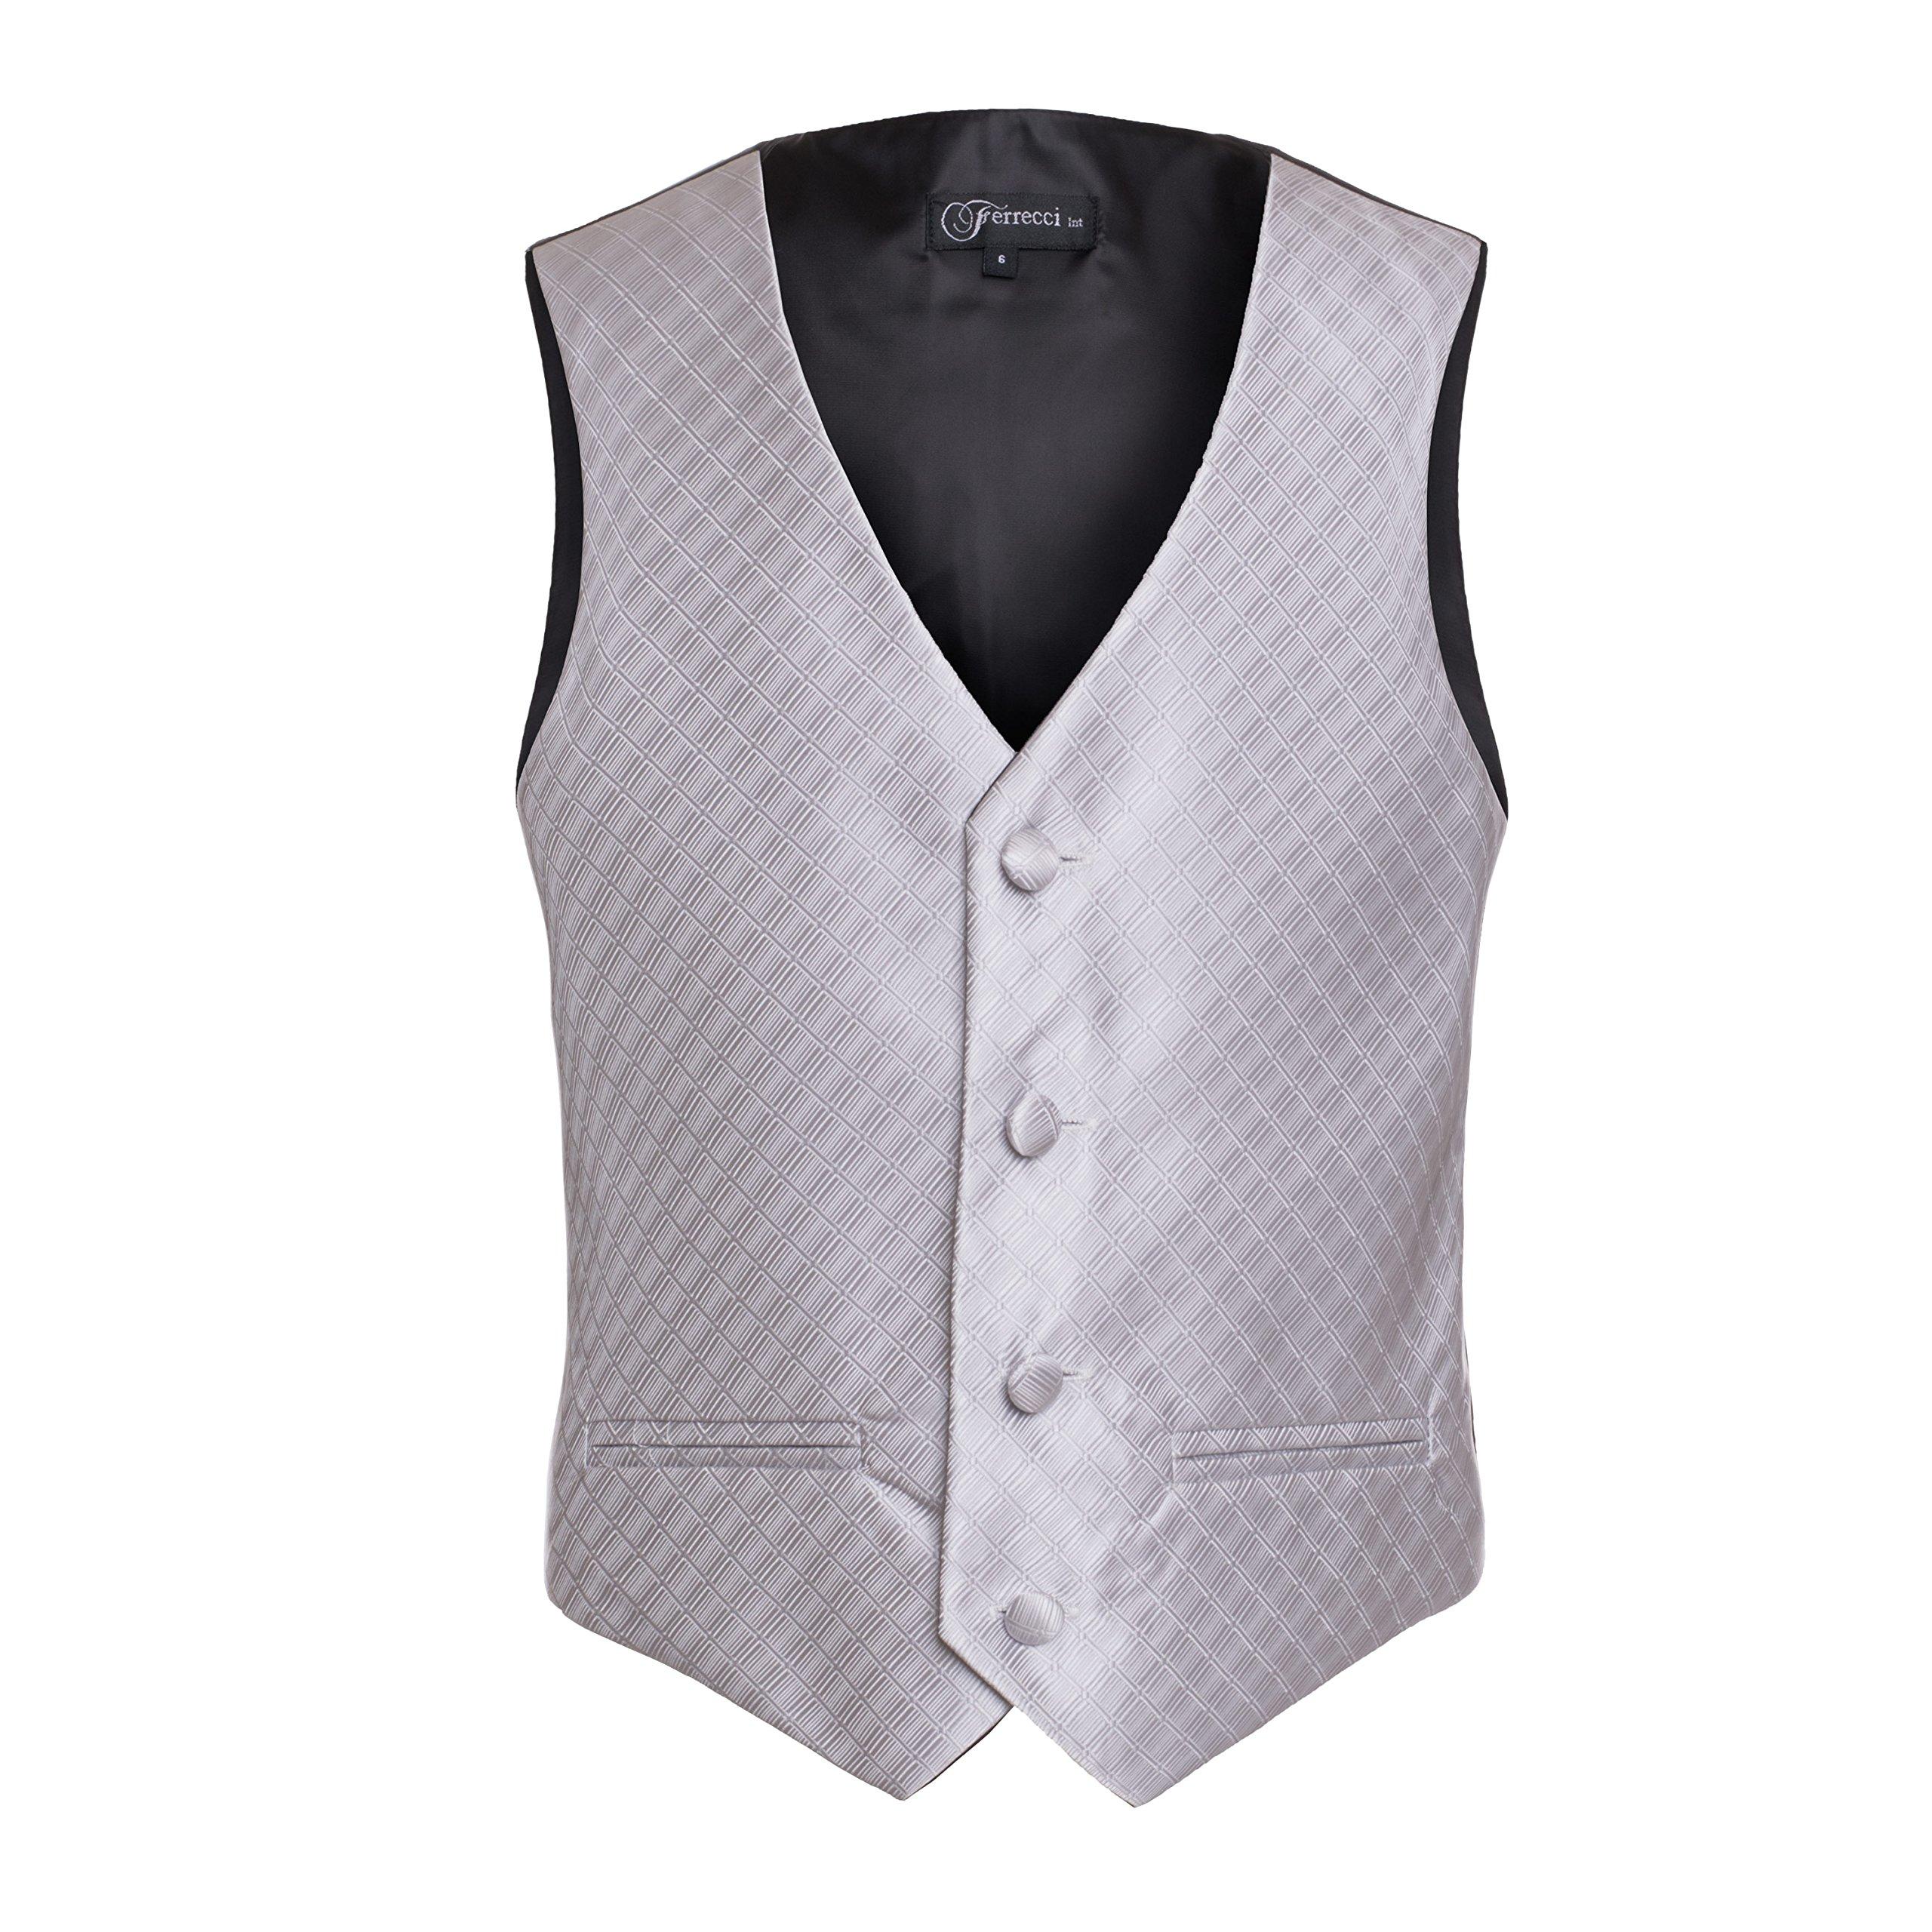 Ferrecci Boys Silver Premium 300 Vest Hankie Necktie Bow Tie Set, Size 8